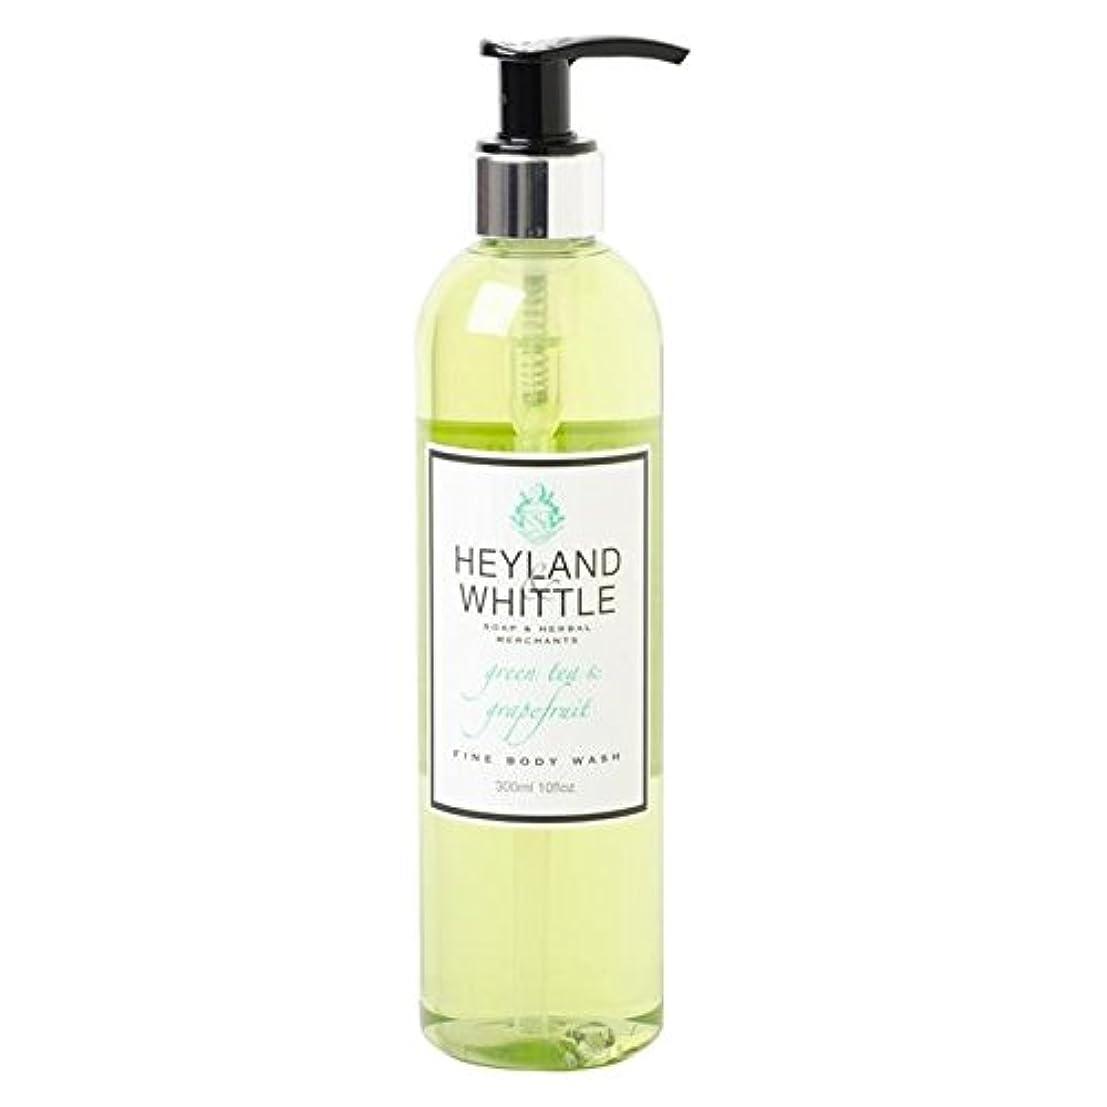 Heyland & Whittle Greentea & Grapefruit Body Wash 300ml (Pack of 6) - &削るグリーンティ&グレープフルーツボディウォッシュ300ミリリットル x6 [...